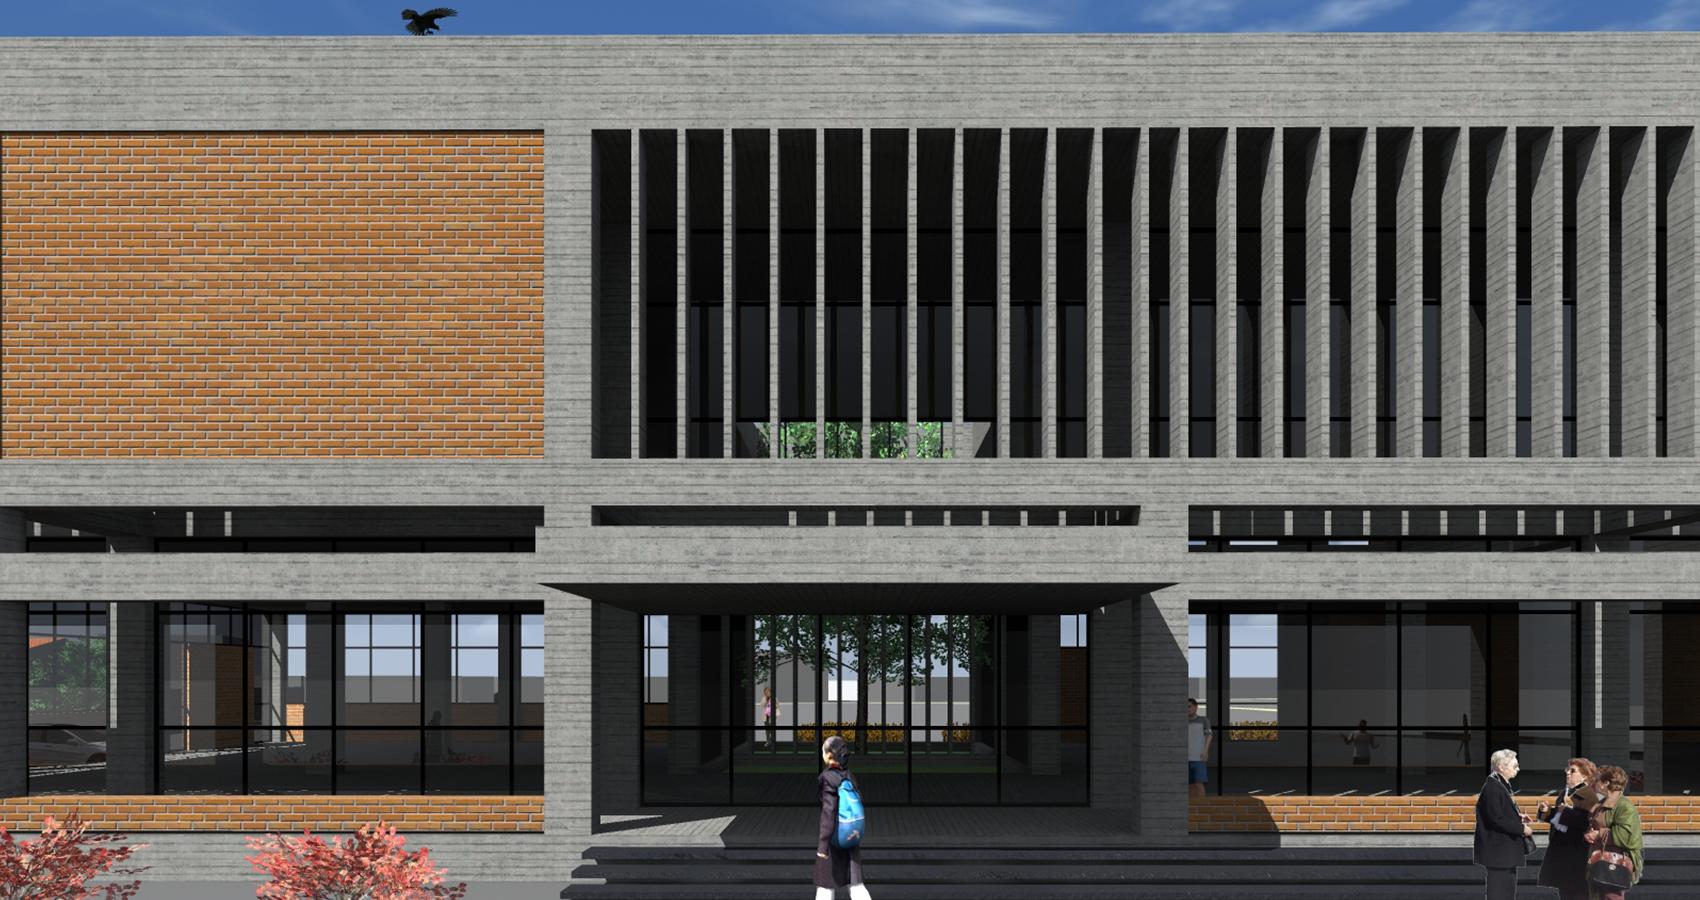 PJV - Biblioteca Municipal de Barra Velha